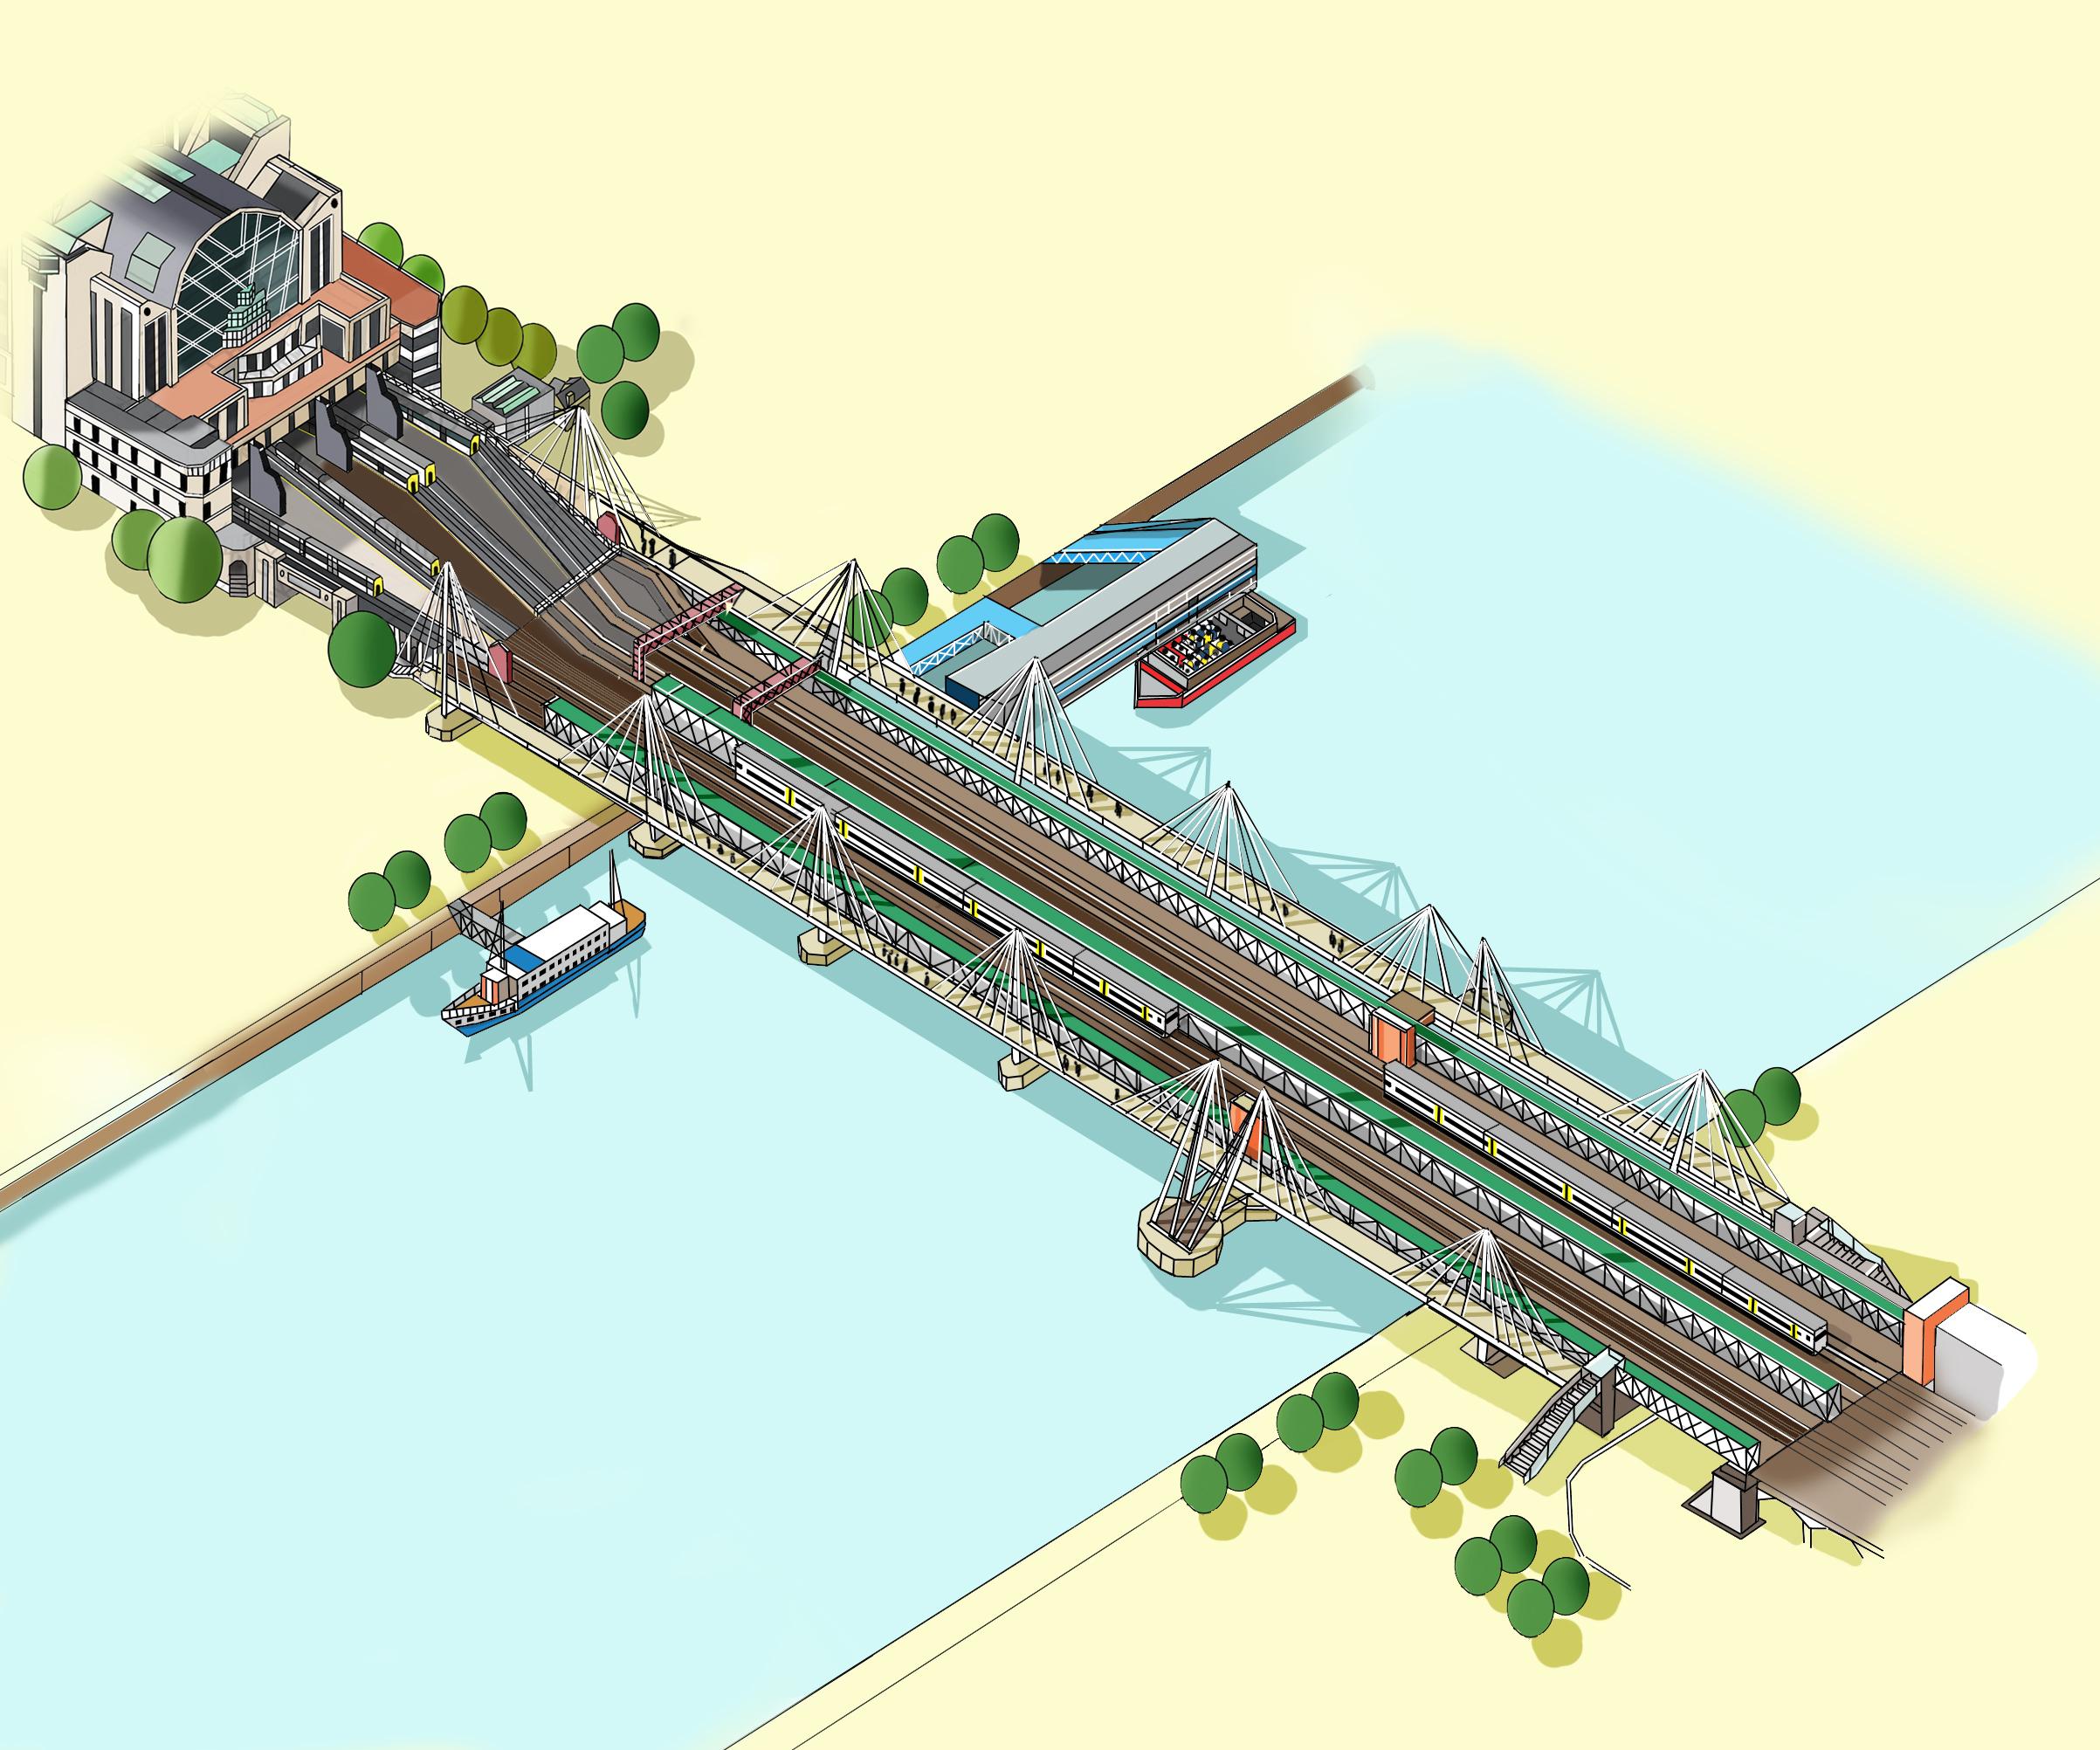 Hungerford Bridge Illustration by Katherine Baxter